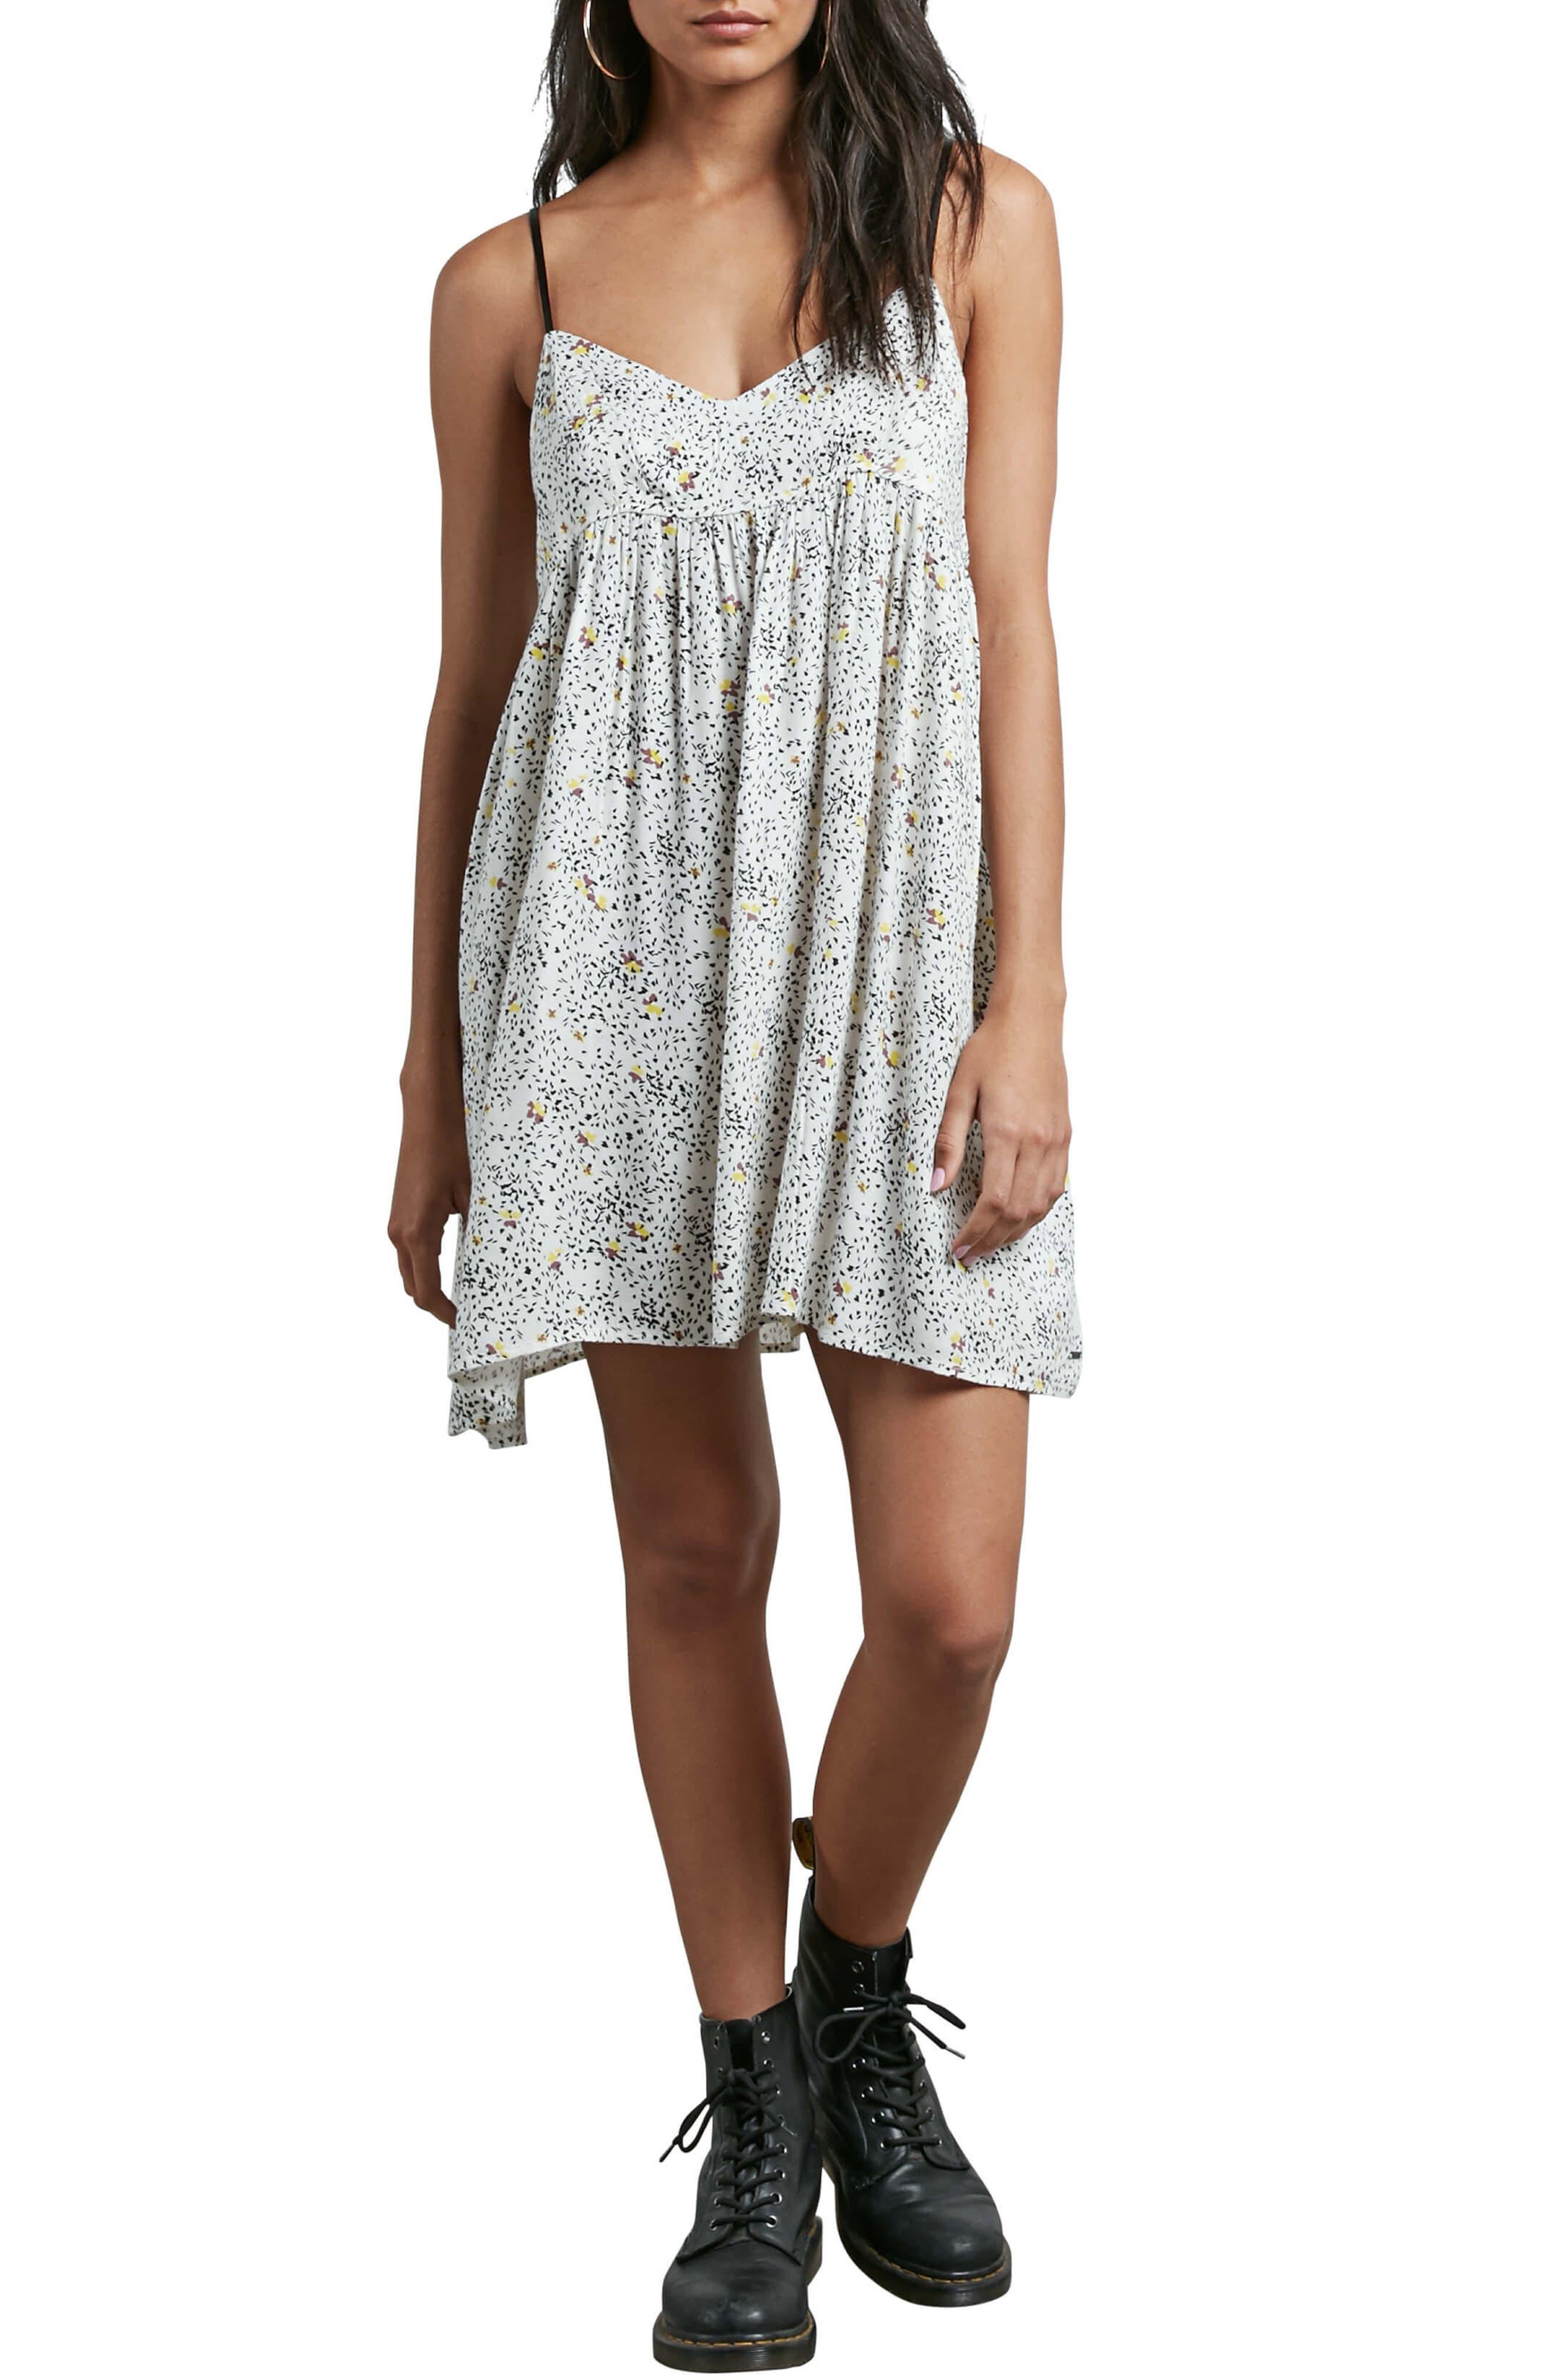 Thx It's a New Dress Babydoll Dress,                             Main thumbnail 1, color,                             White